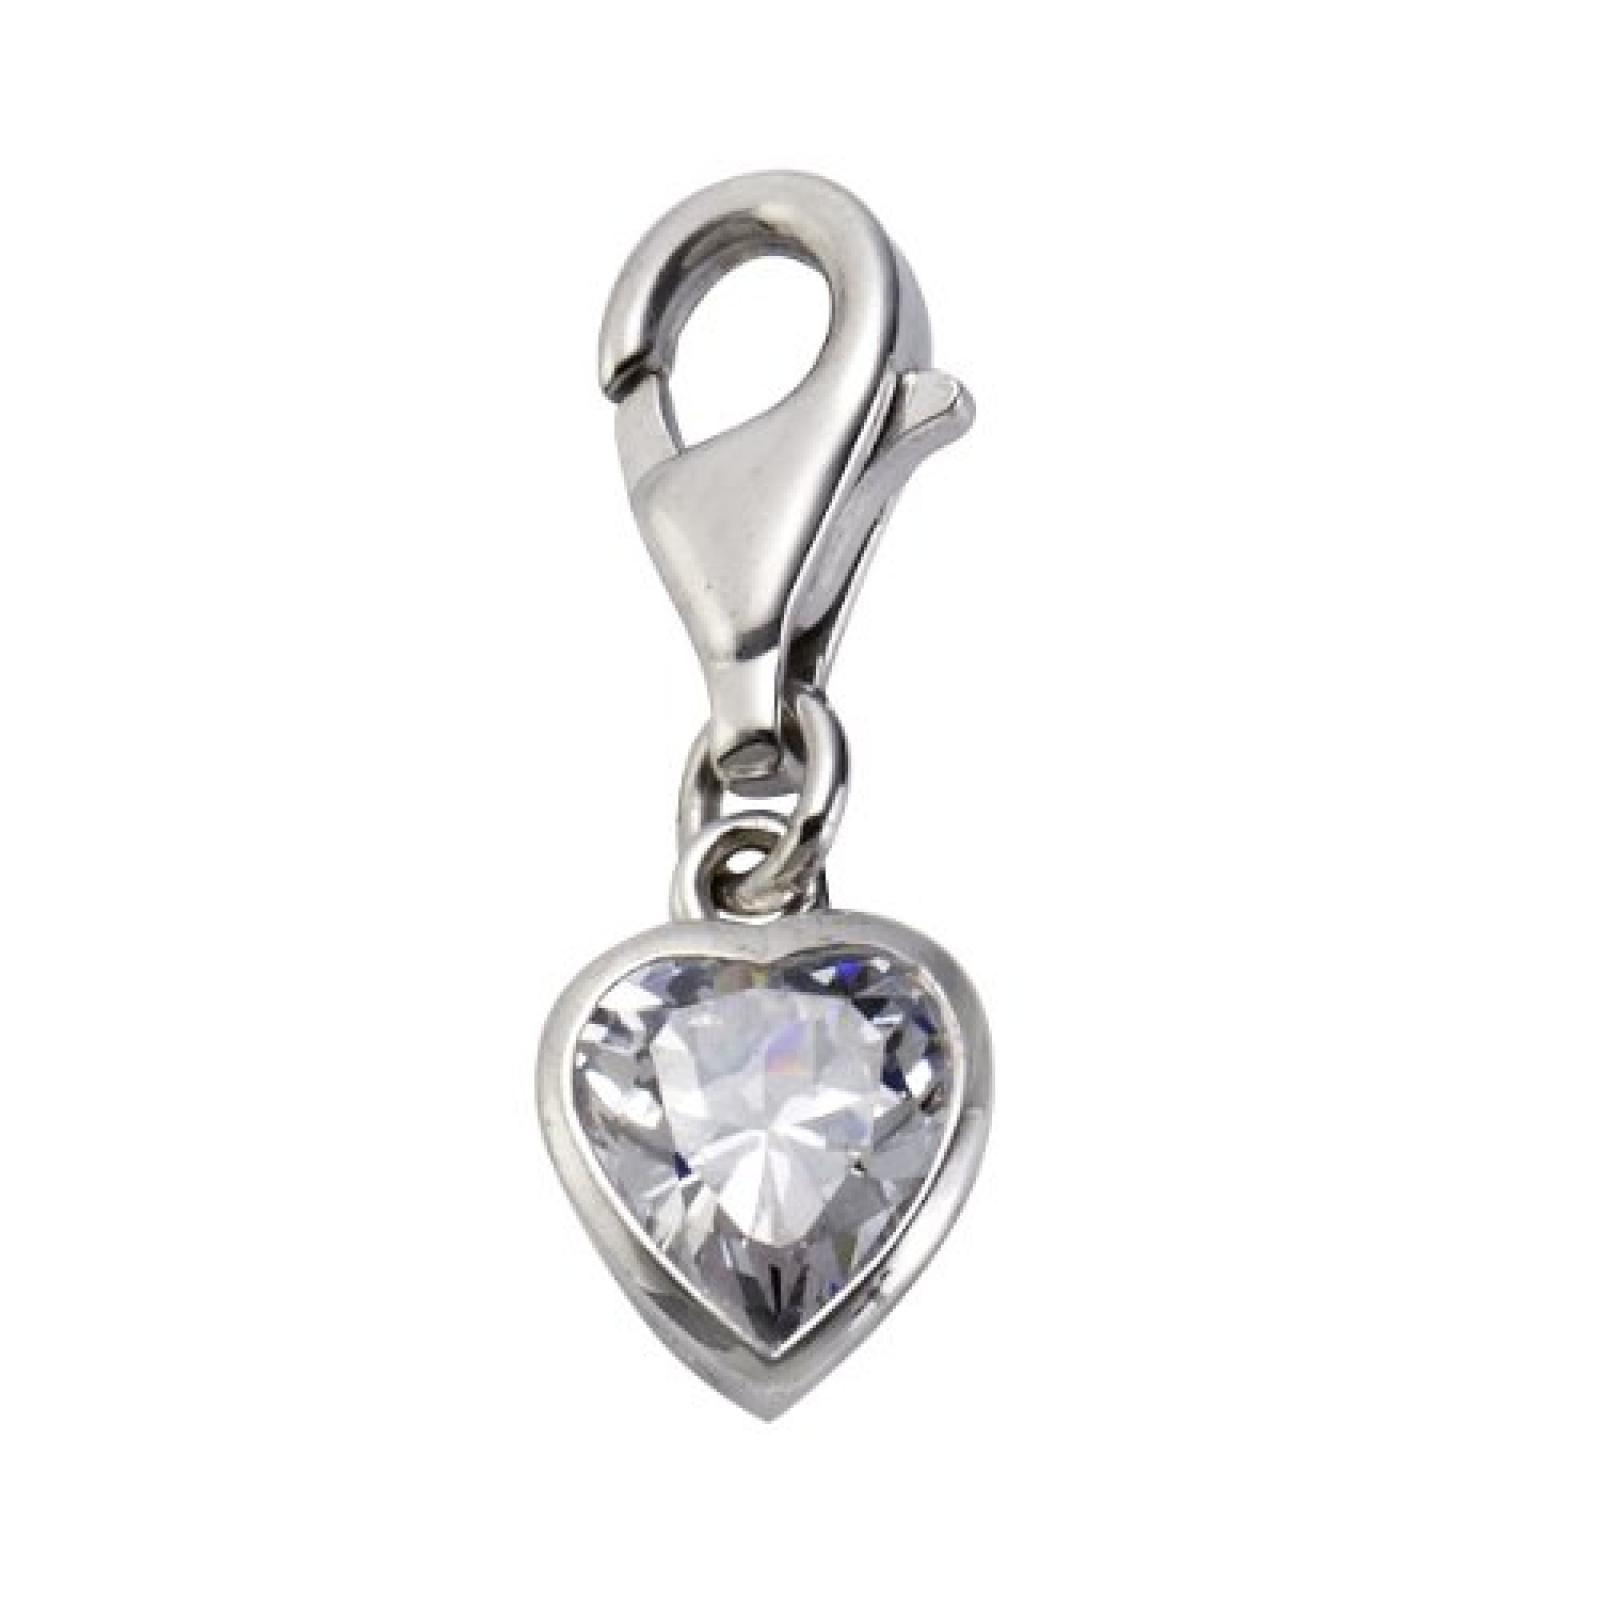 ZEEme Damen-Charm Anhänger 925 Sterling Silber Herz Zirkonia 273240800